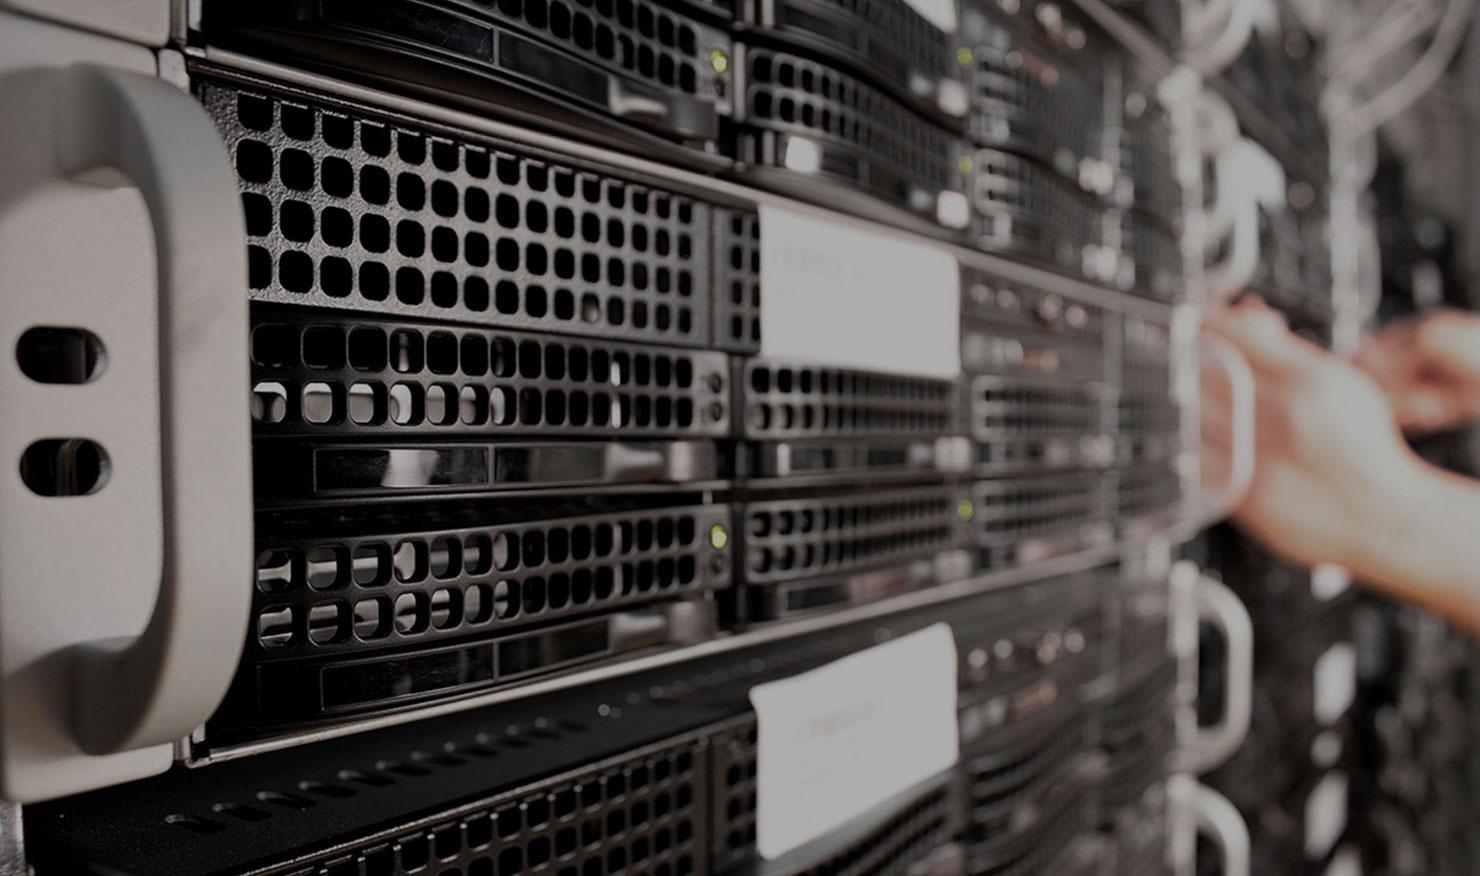 http://sedaser.com/wp-content/uploads/2018/07/servidores1.jpg